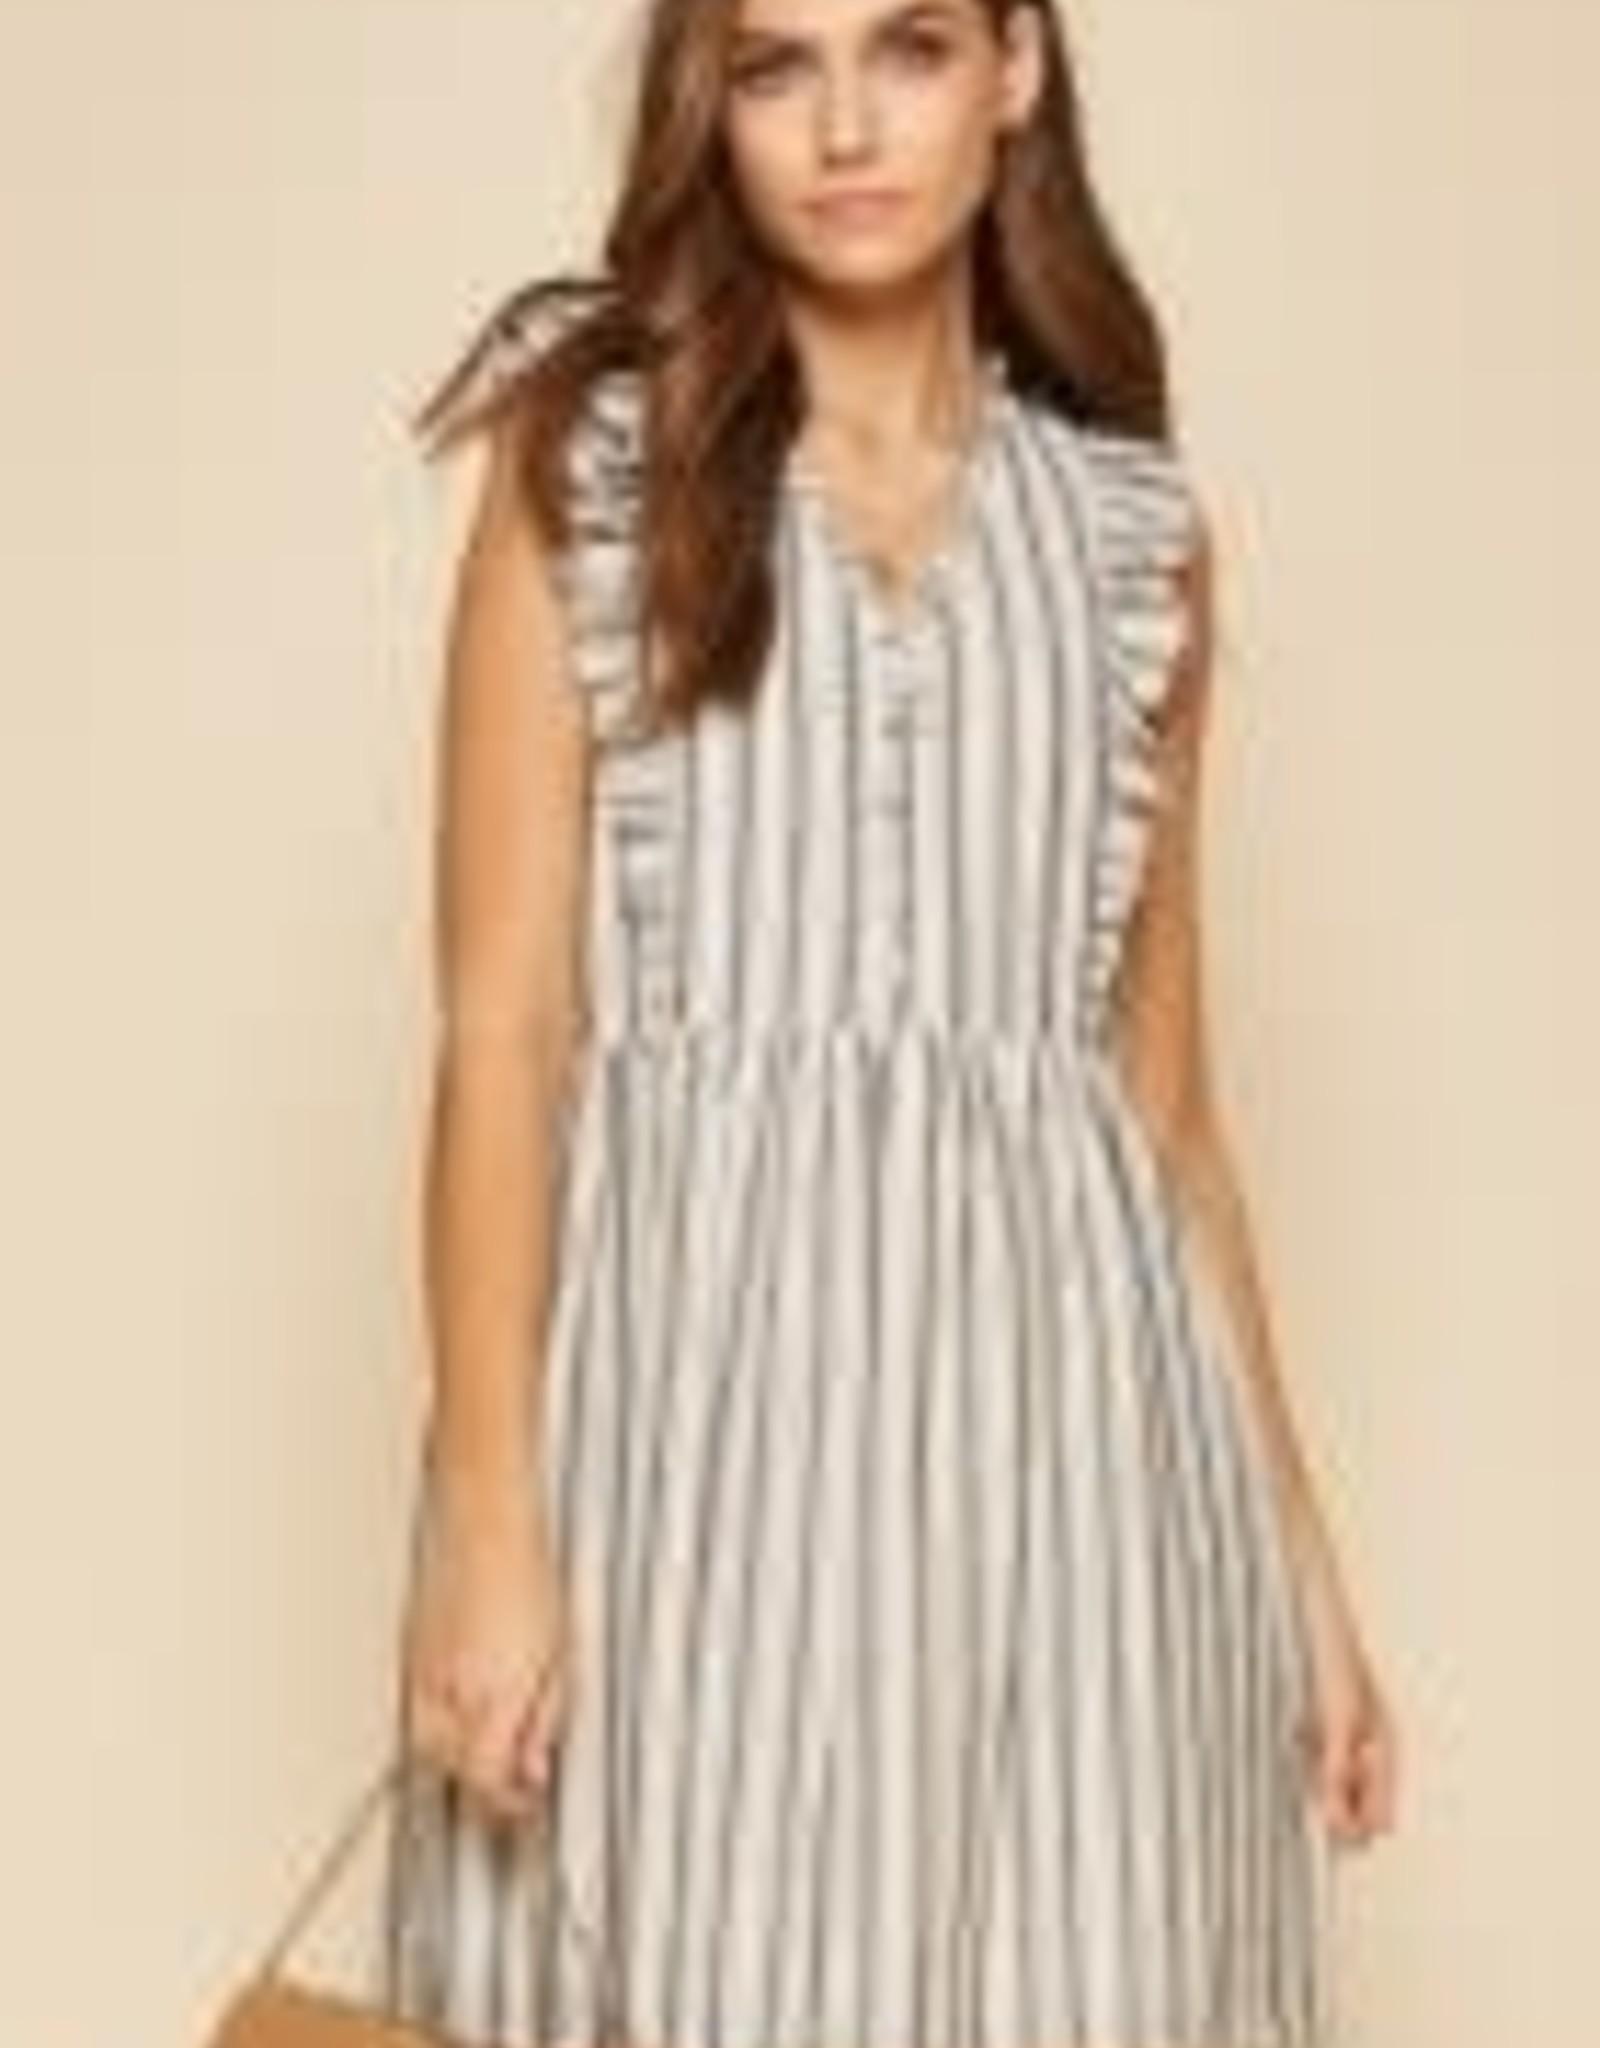 AndreByUnit Andre- Chic Ruffle Dress